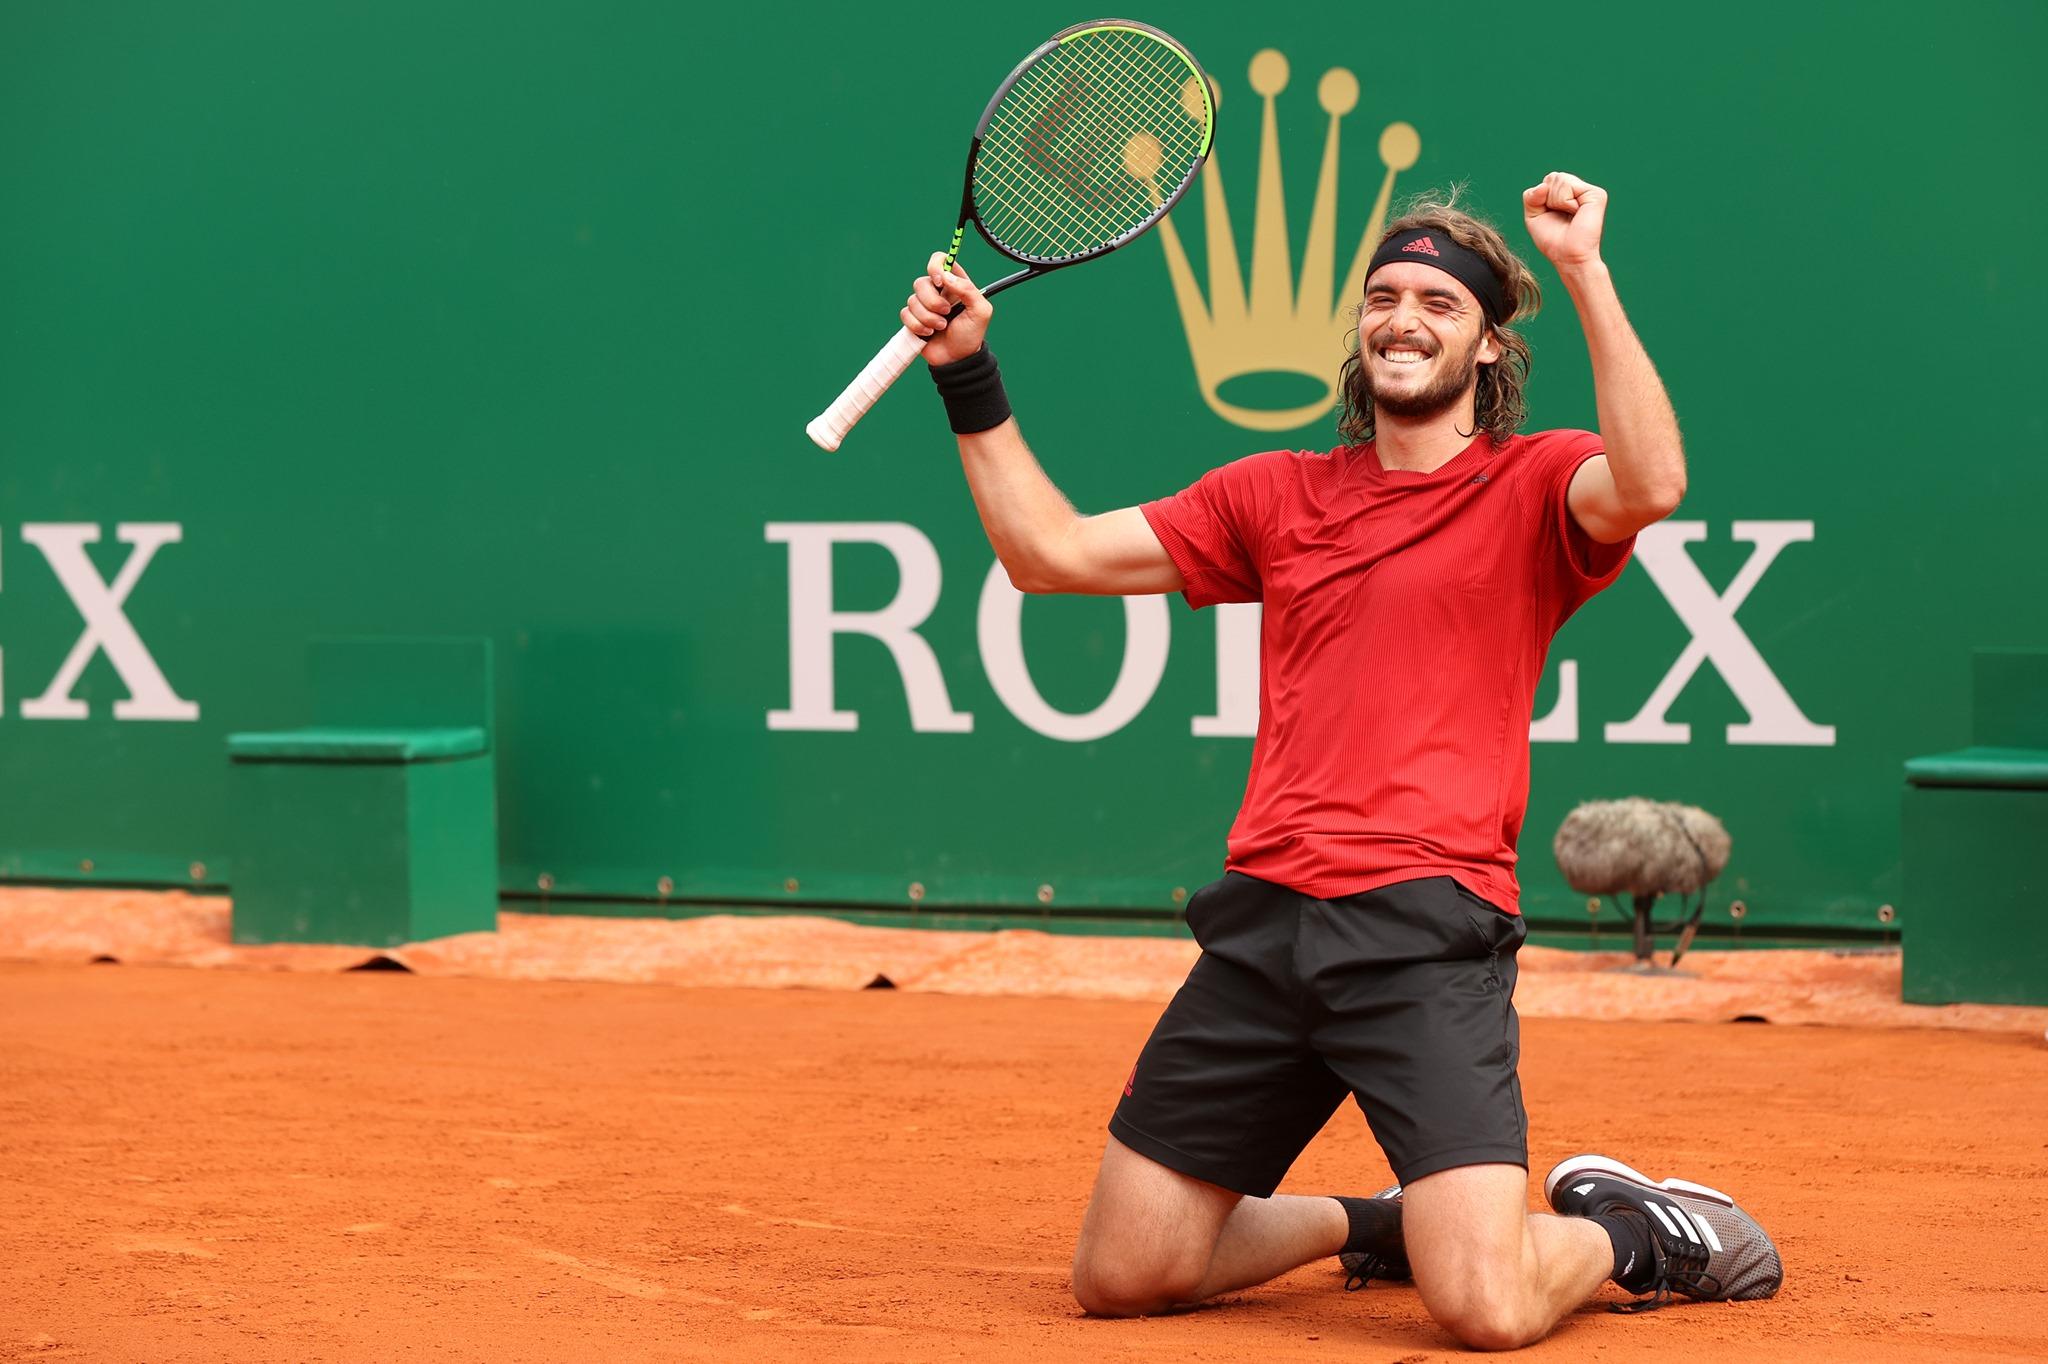 174703772 10159490148508701 9190151762833839933 n - ATP Monte Carlo: Tsitsipas do šestega naslova v karieri, prvega na Mastersih